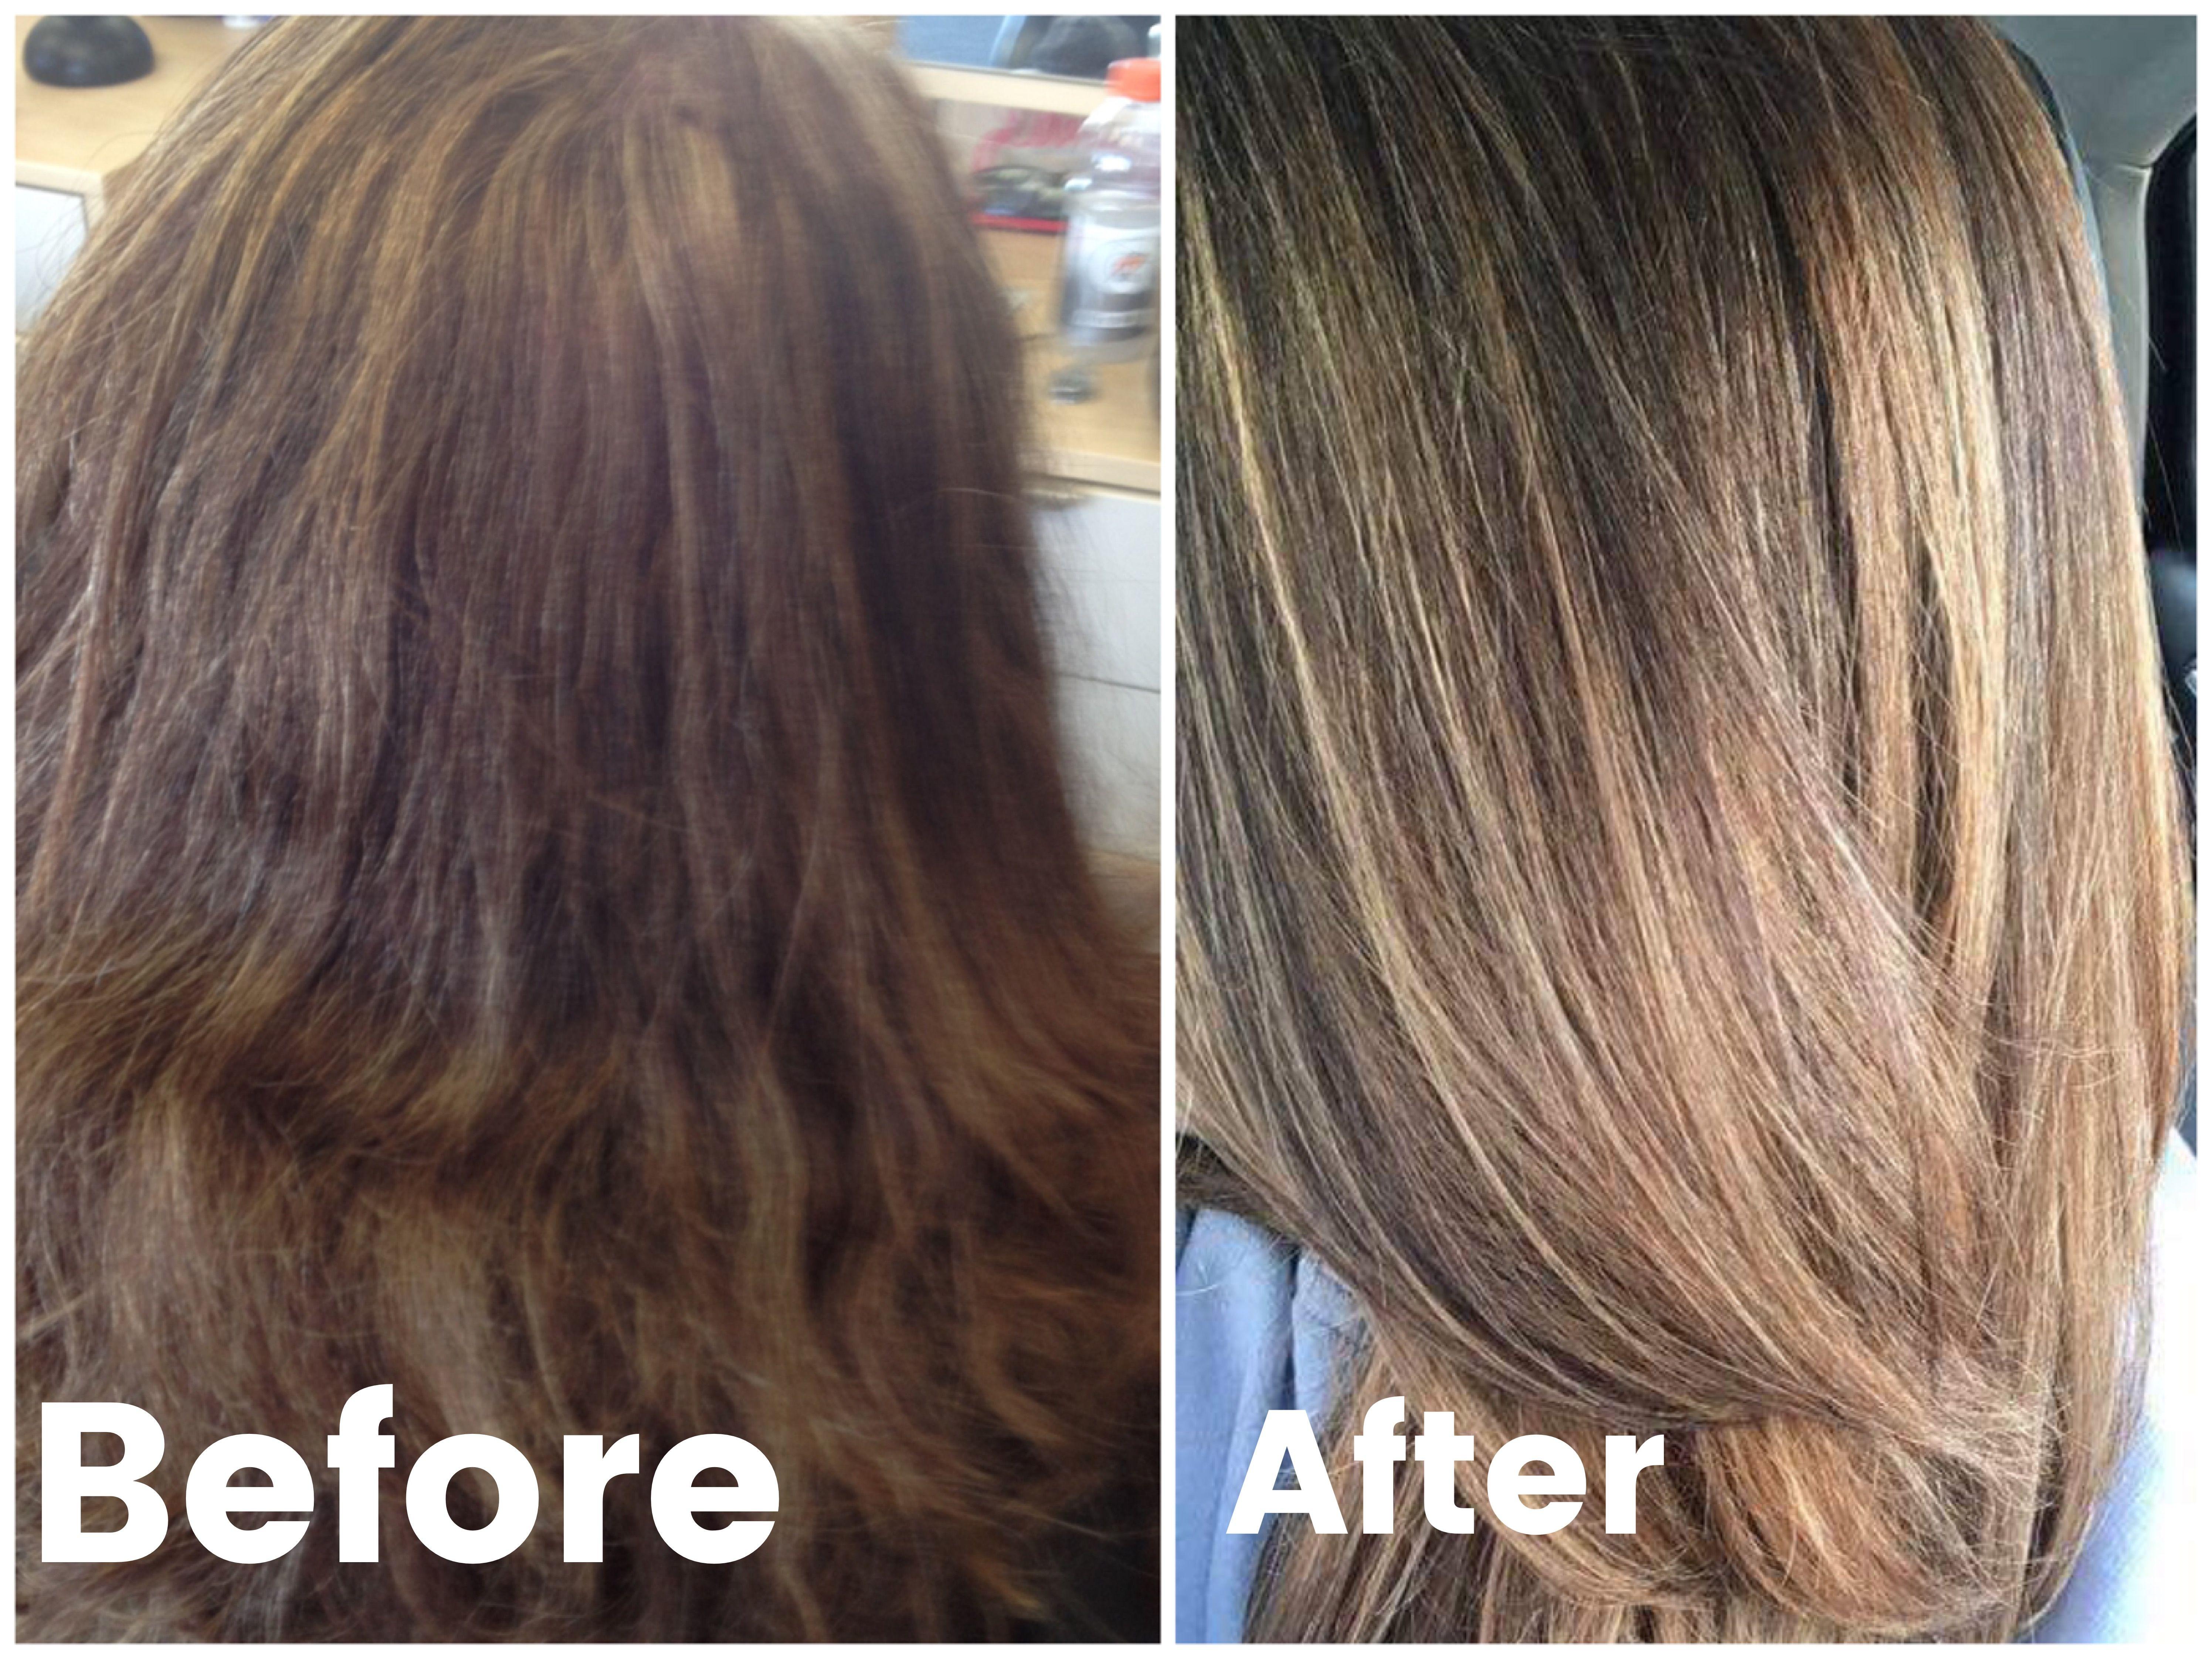 Hair By Maureen Master Stylist Hair Cuttery Norwood Ma Follow Me On Ig Maureenmlydon Fb Maureenmurphylydon Hair Cuttery Long Hair Styles Hair